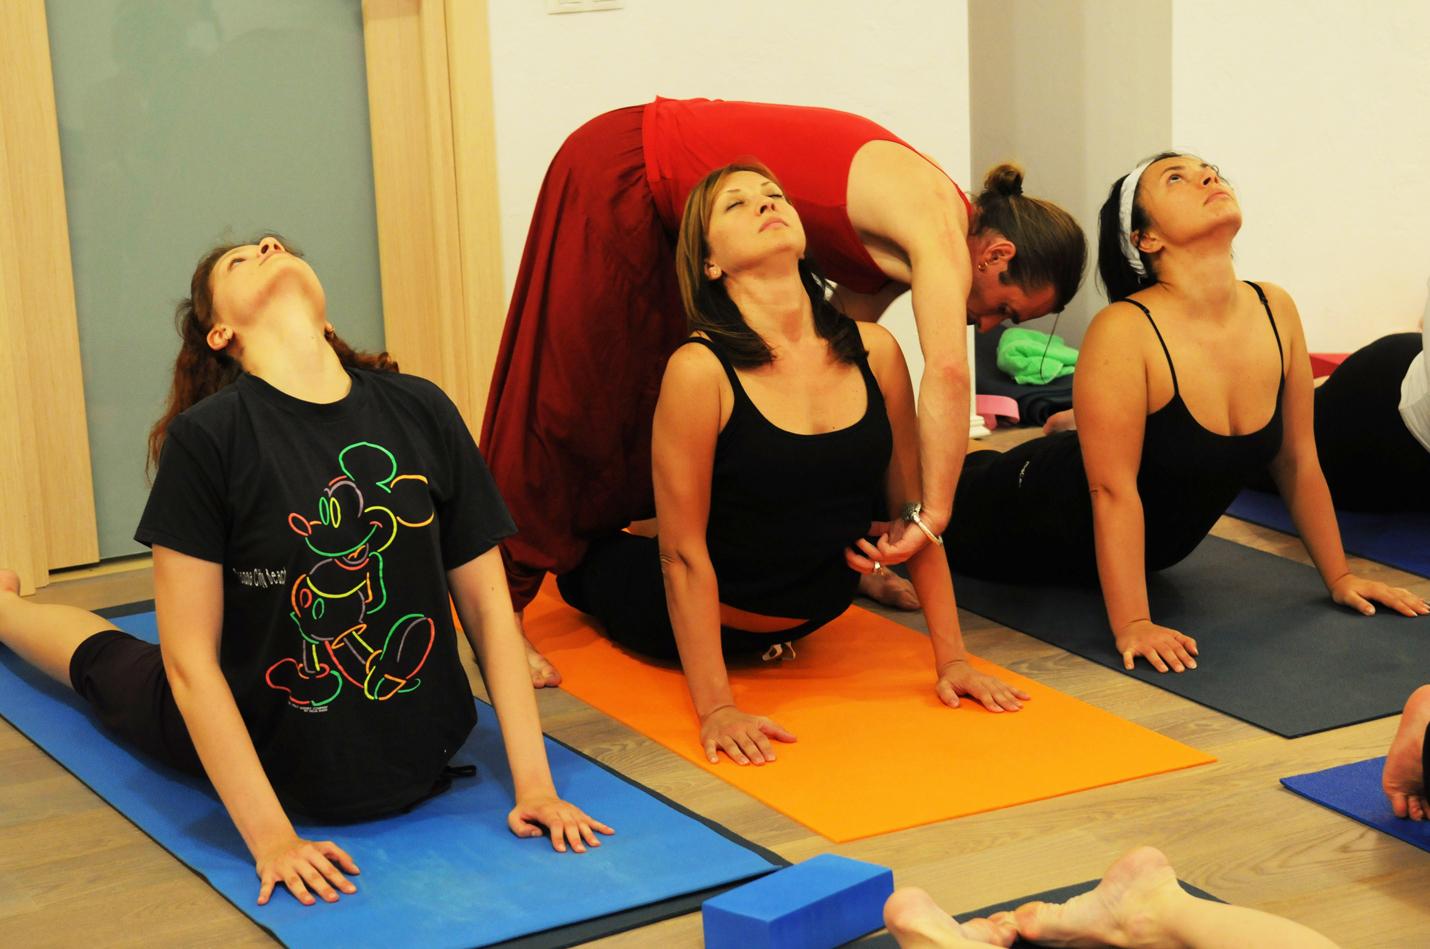 йога-студия в сургуте